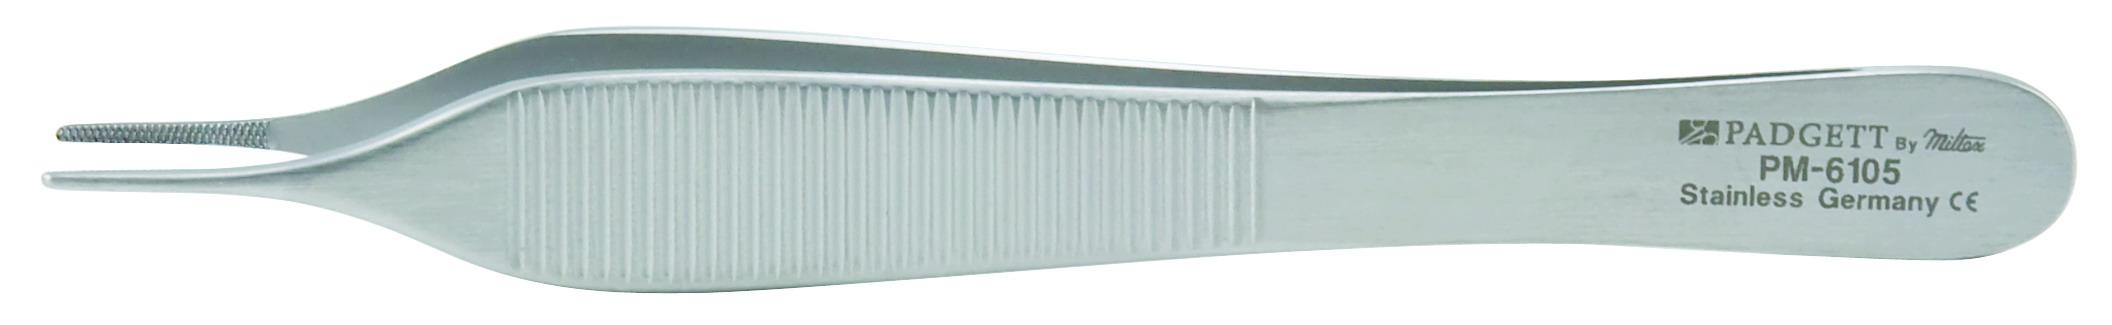 adson-dressing-forceps-delicate-cross-serrated-tips-4-3-4-11mm-length-pm-6105-miltex.jpg